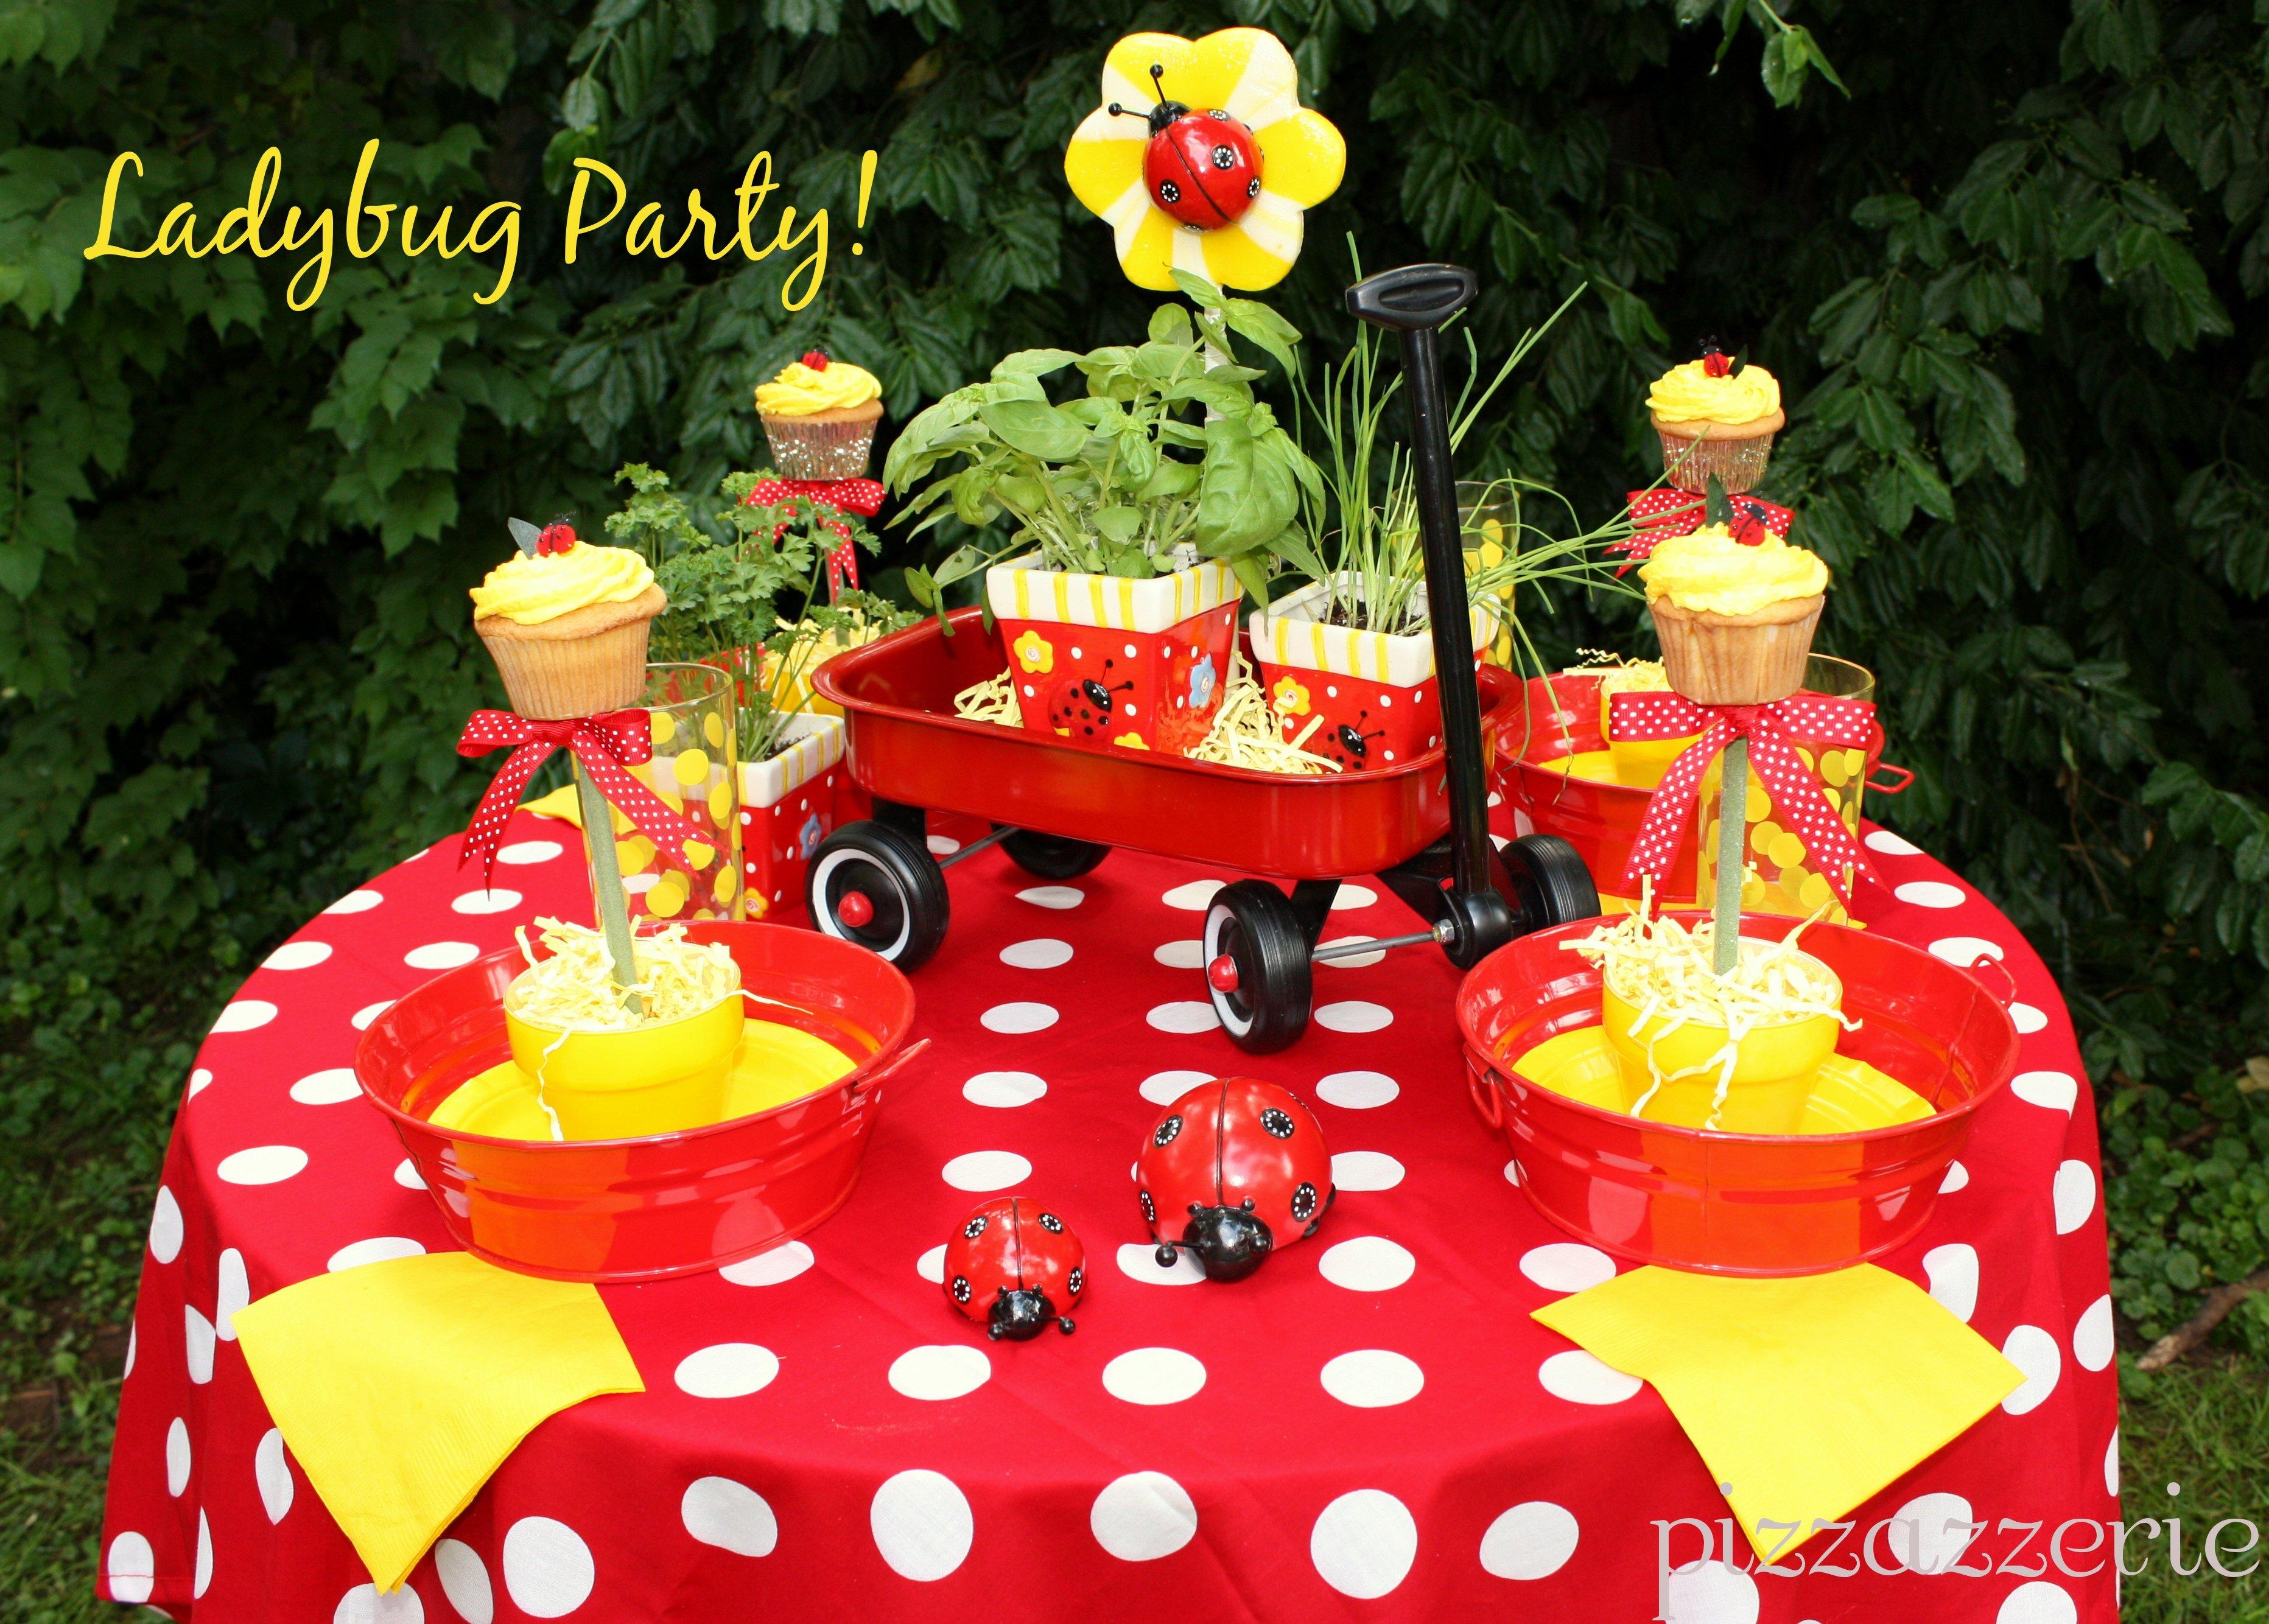 Ladybug Garden Party!